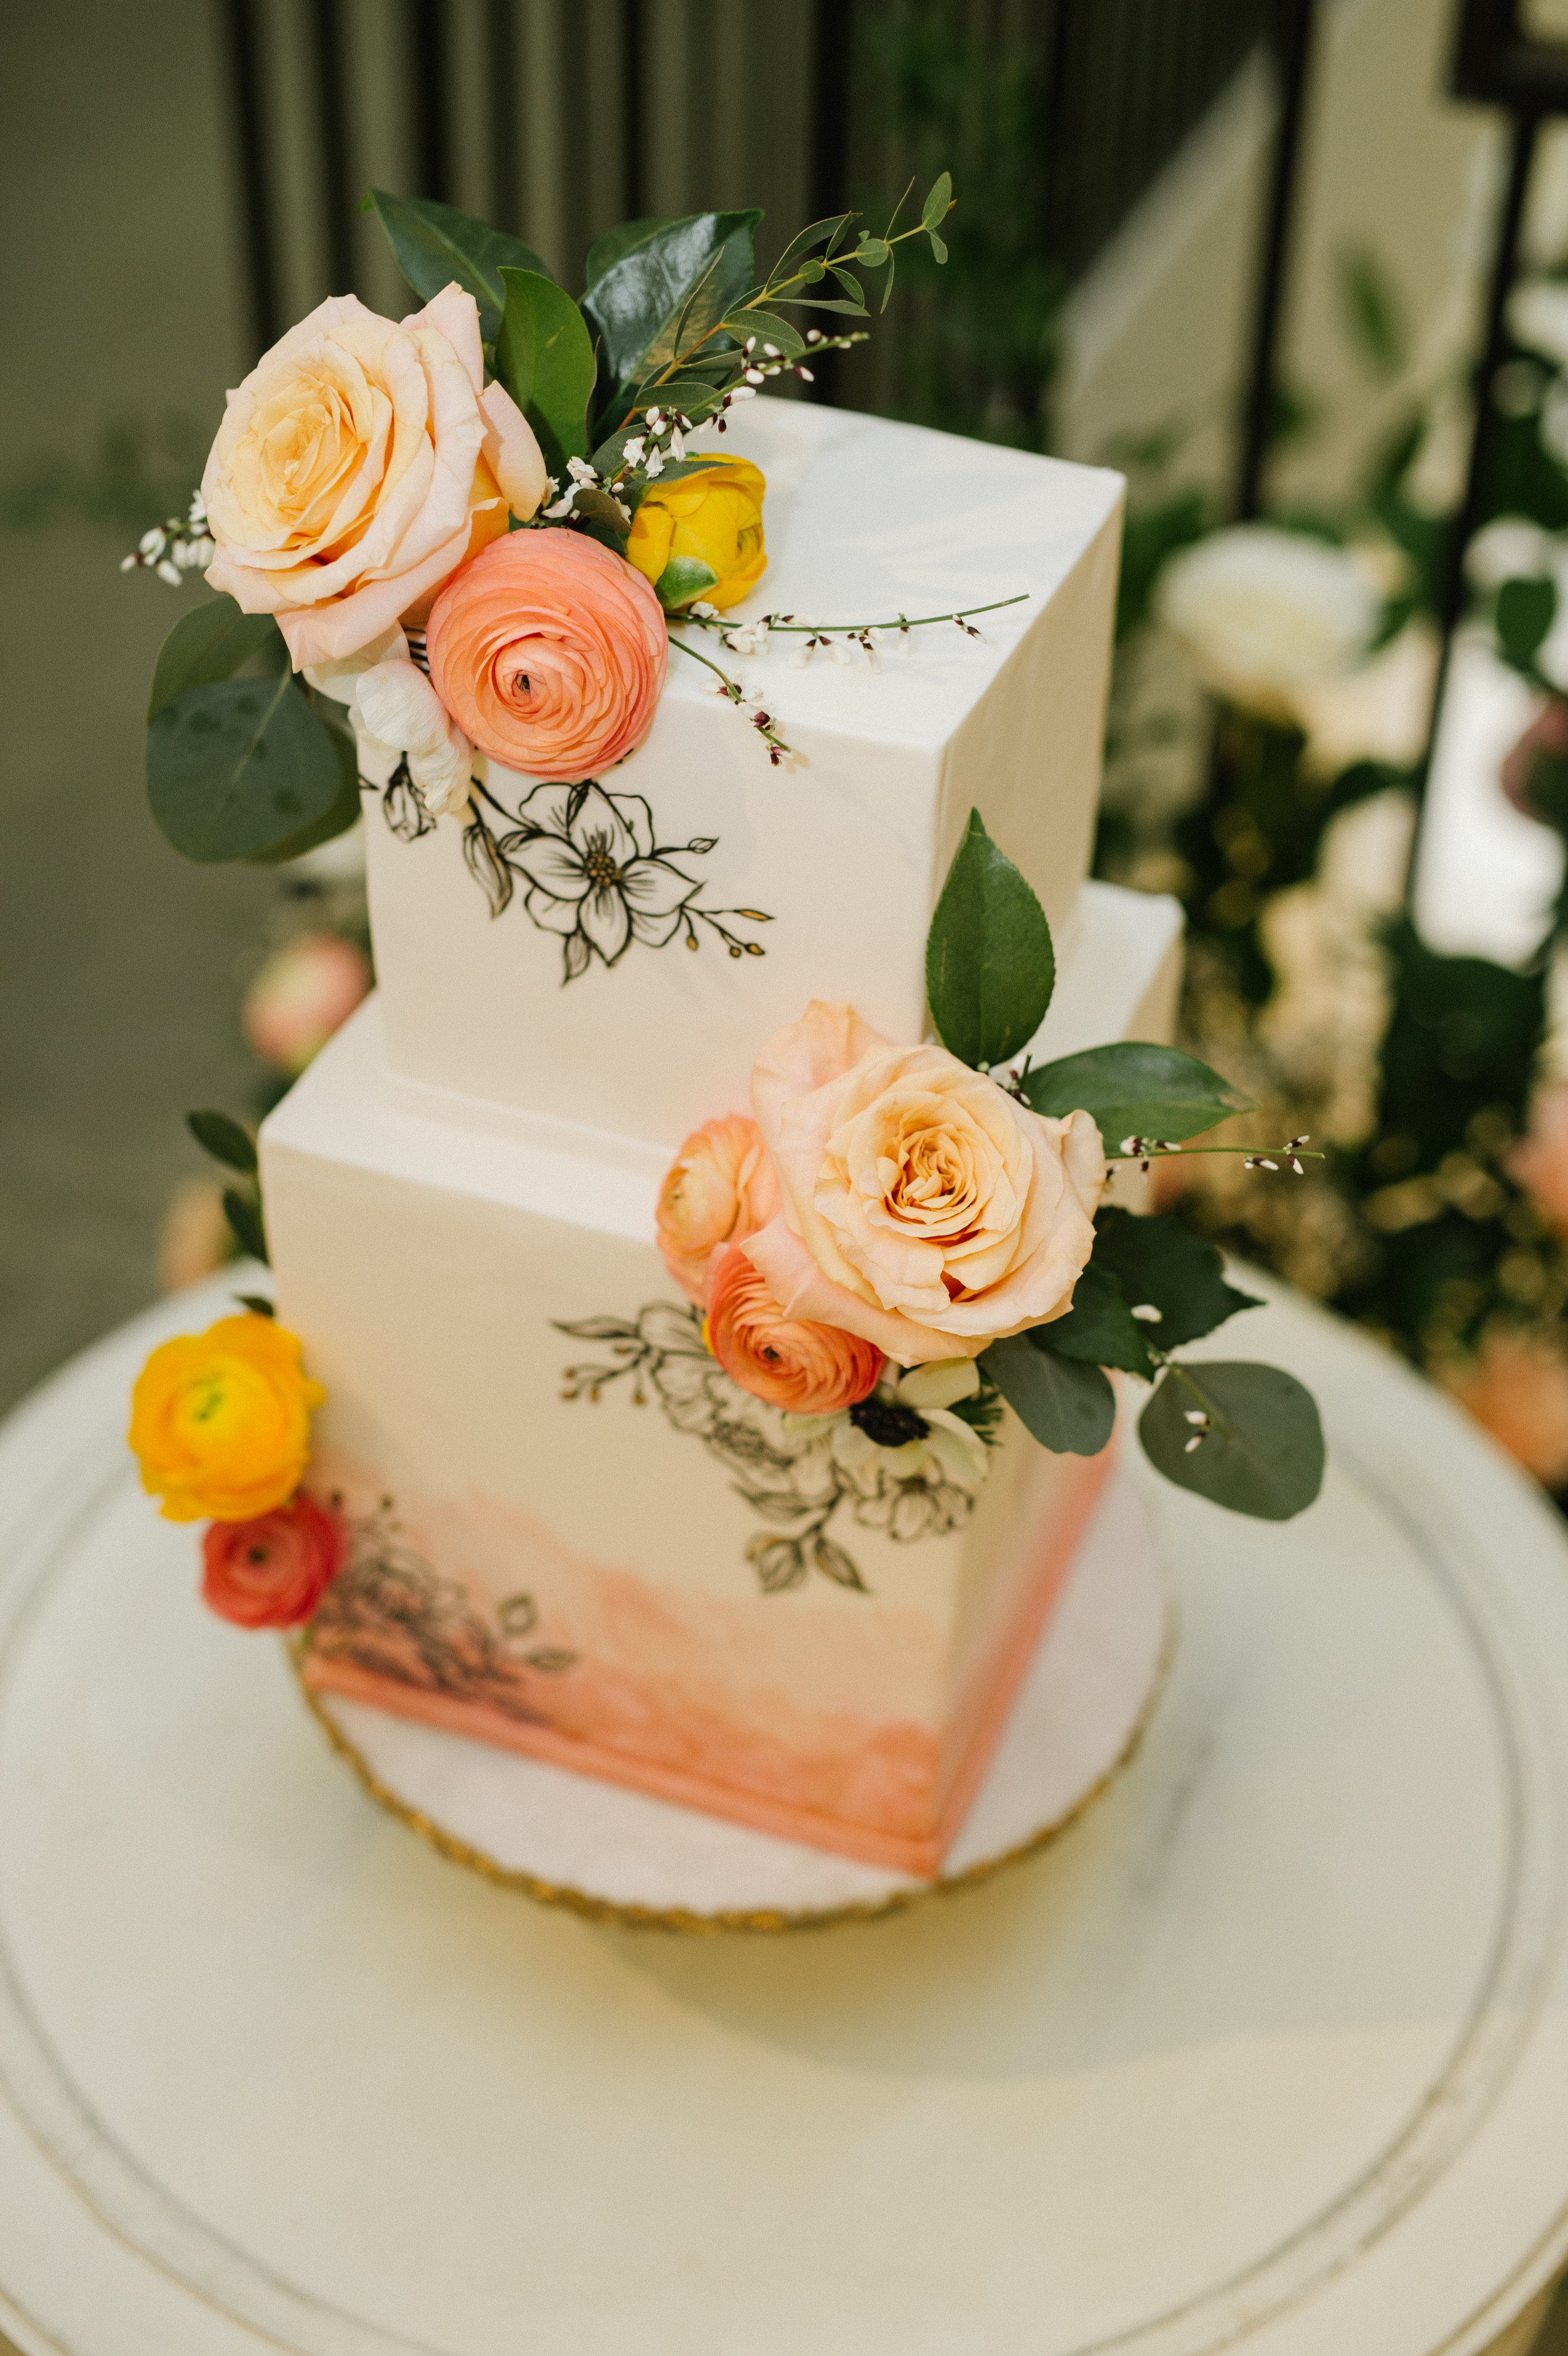 Calgary_Wedding_Photography_City_Garden_Chic_Wedding_Shoot_2019_HR089.jpg